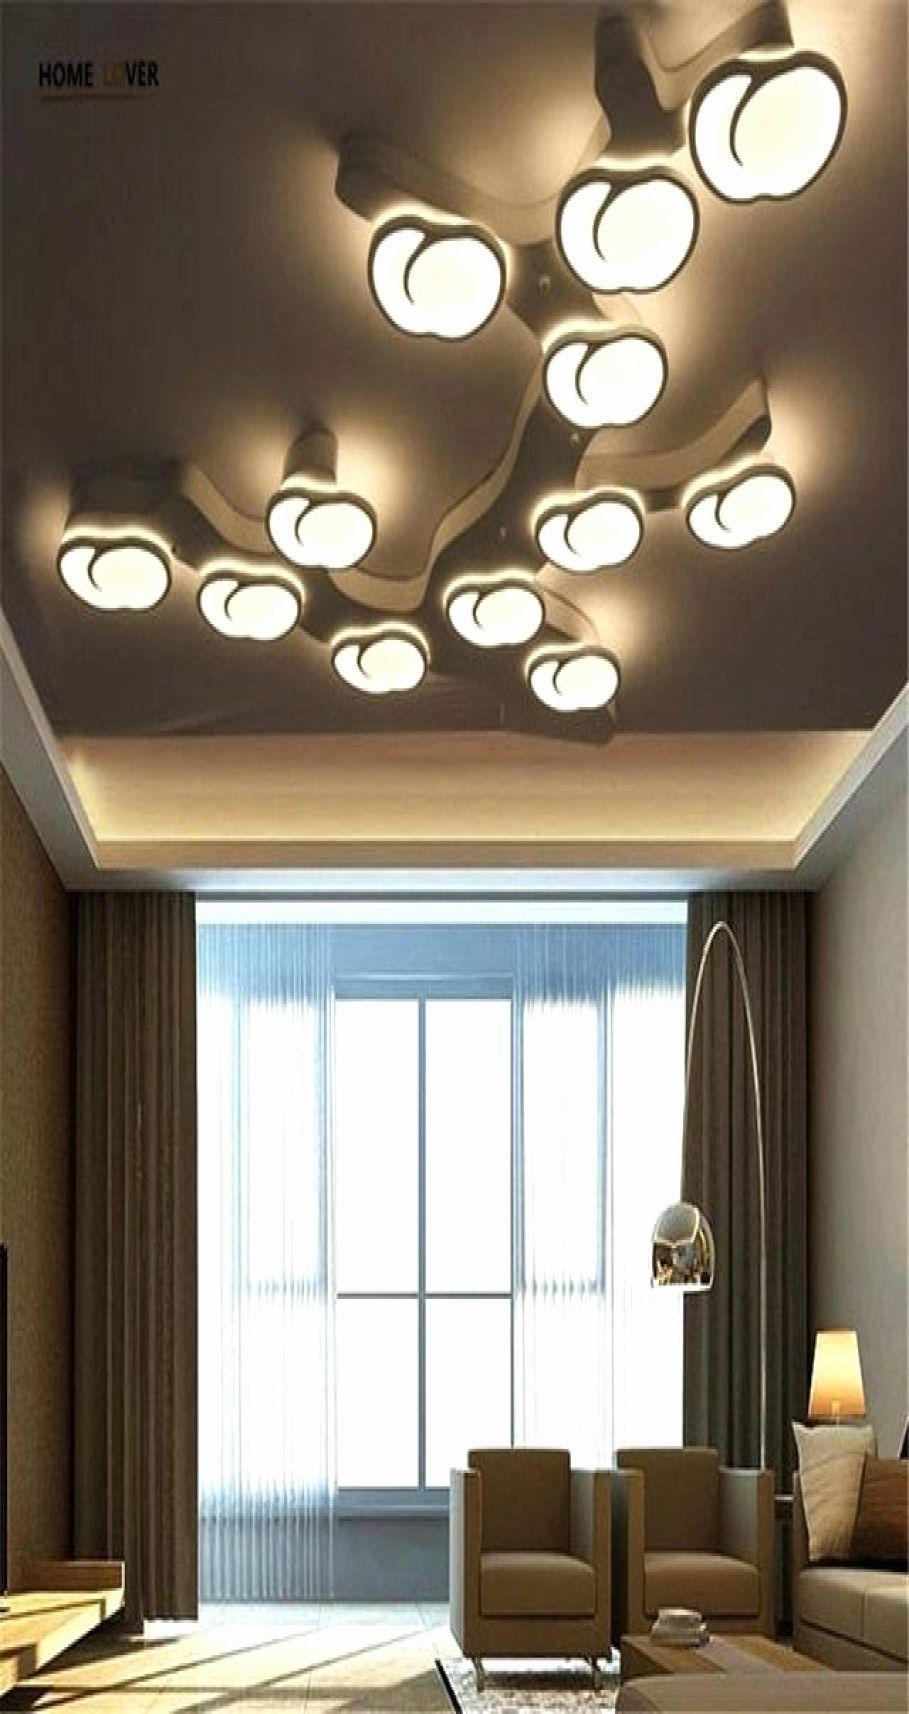 29 Elegant Design Deckenleuchten Wohnzimmer Lamps Living Room Modern Led Ceiling Lights Home Decor